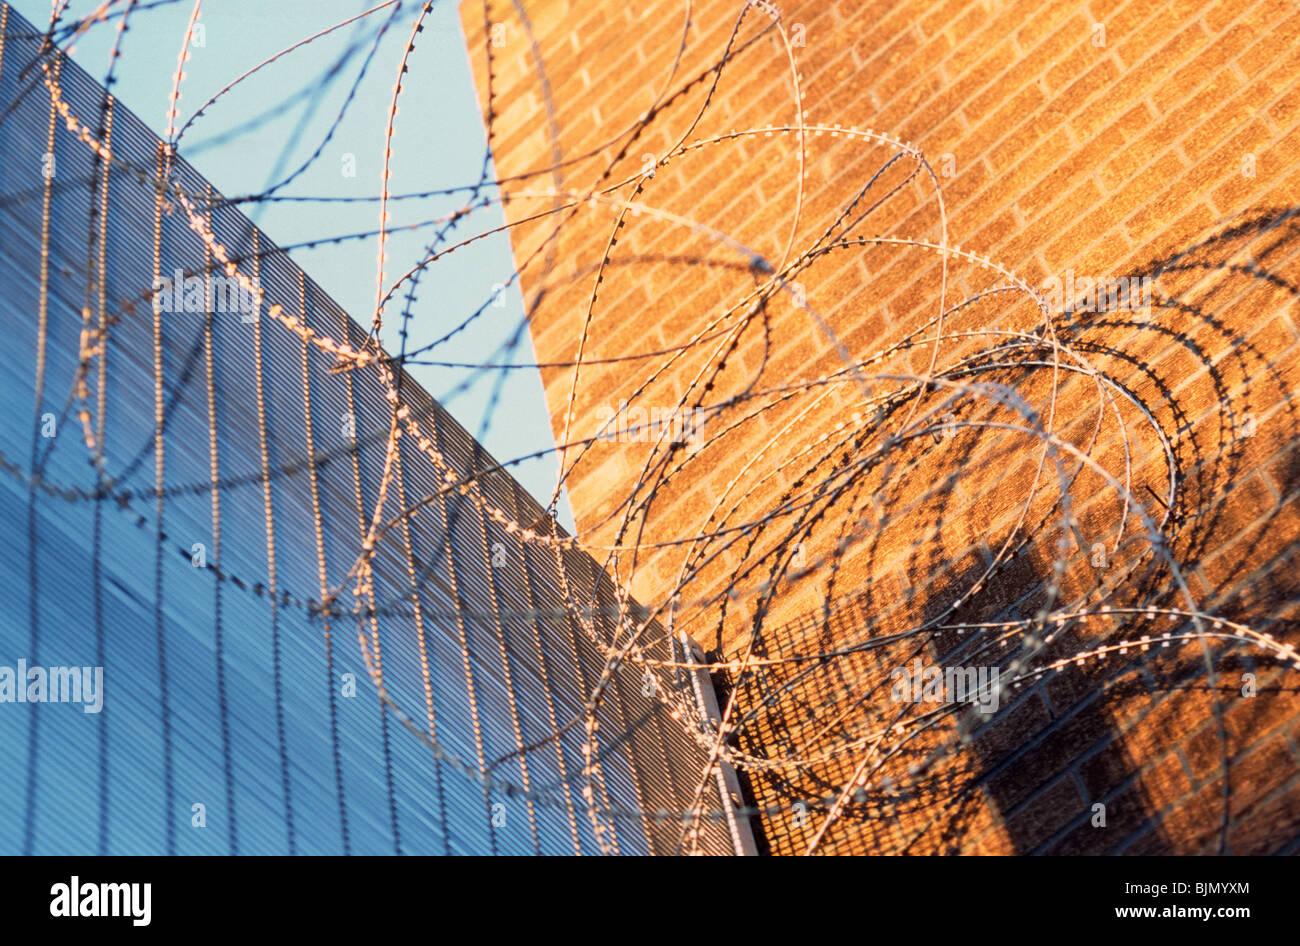 Stacheldraht auf einem Perimeter-Draht-Zaun, HM Prison Cardiff ...